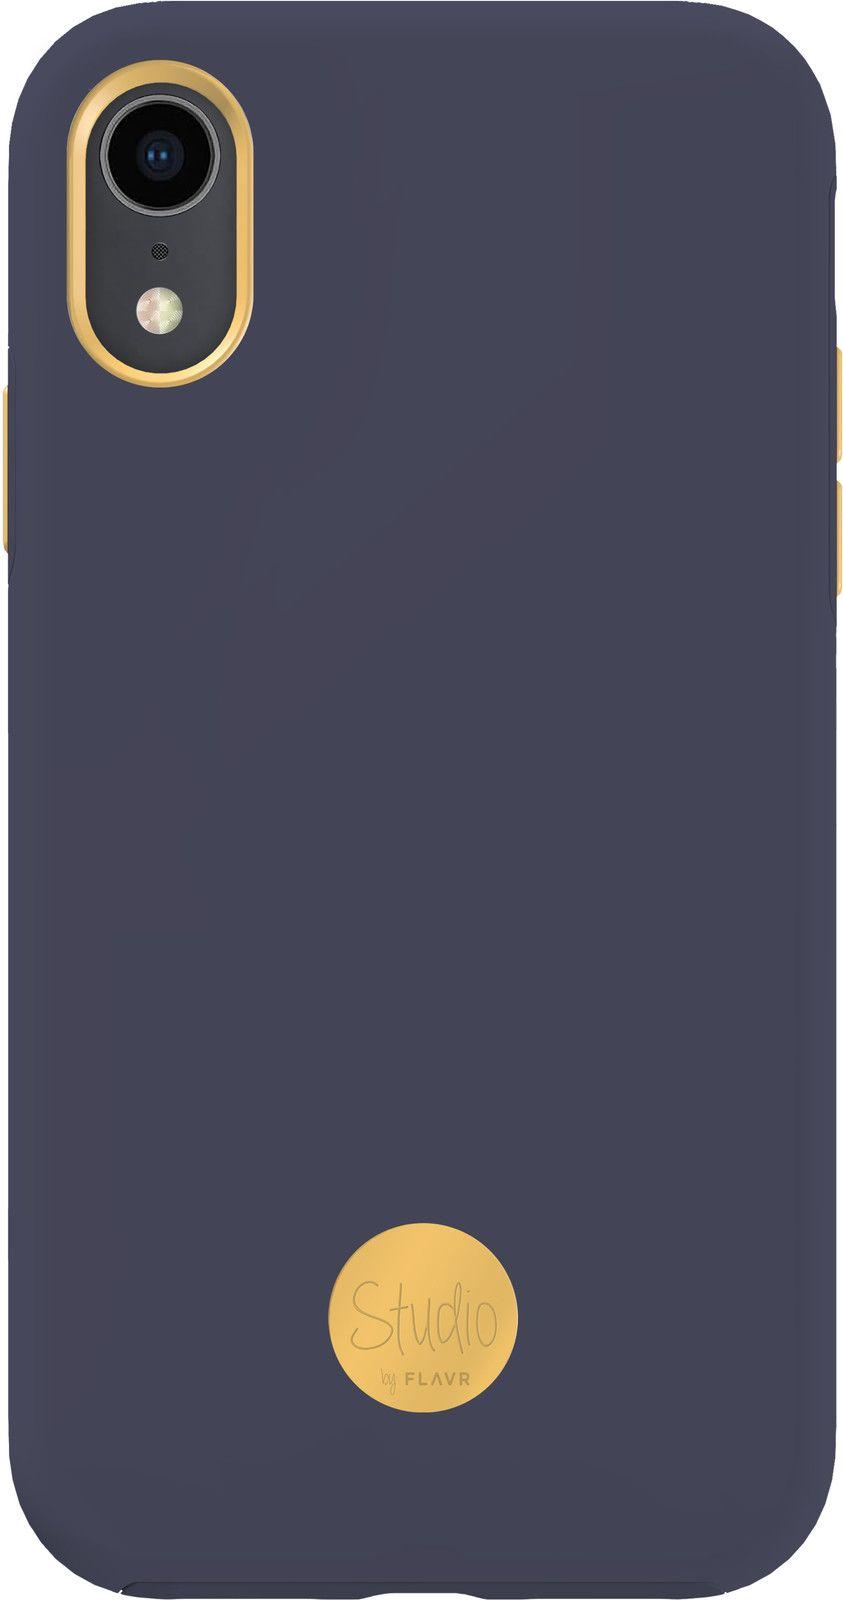 Flavr Studio Pure (Phone Xr) - Blå